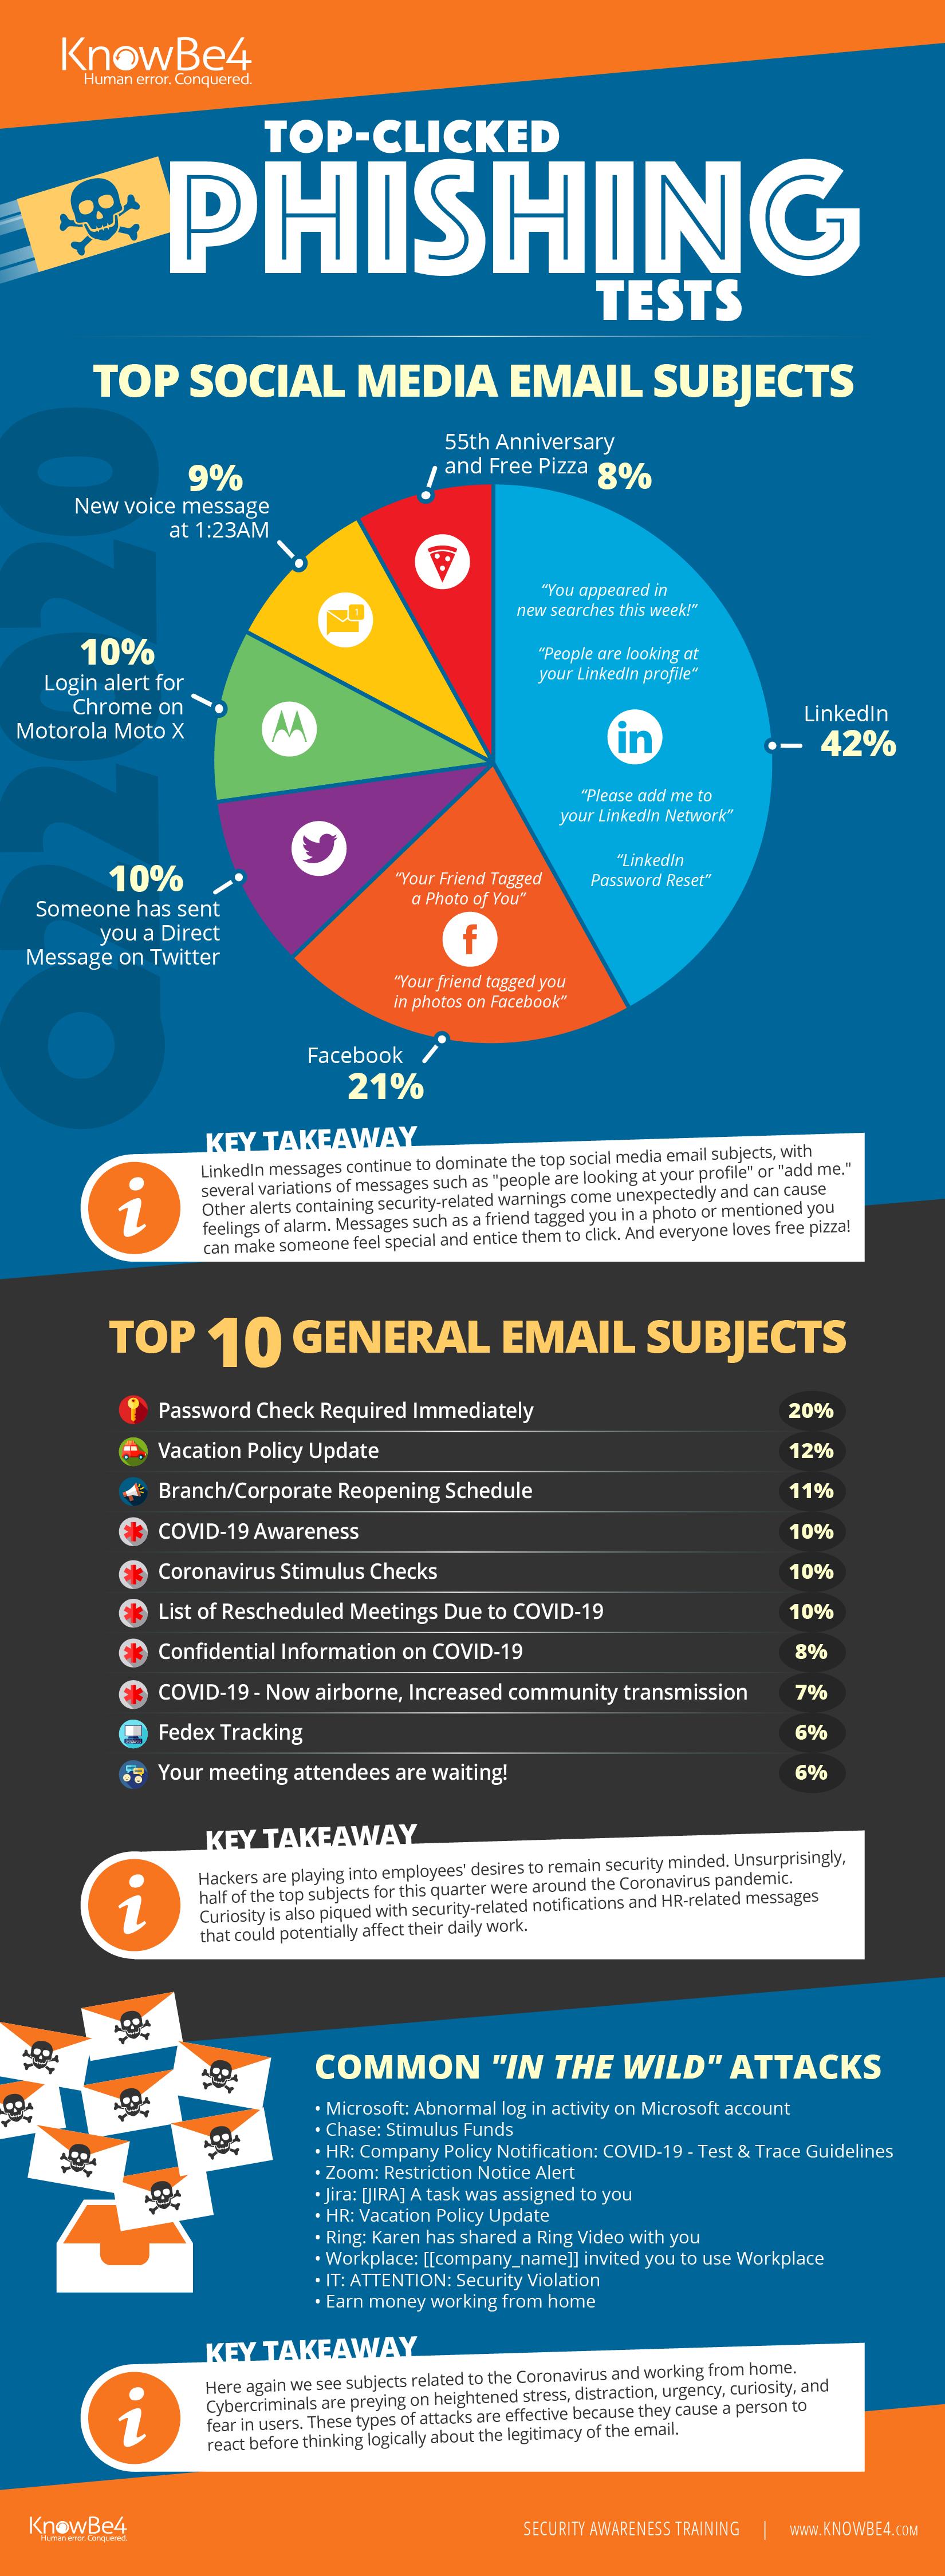 Q2 2020 KnowBe4 Finds Coronavirus-Related Phishing Email Attacks Spike